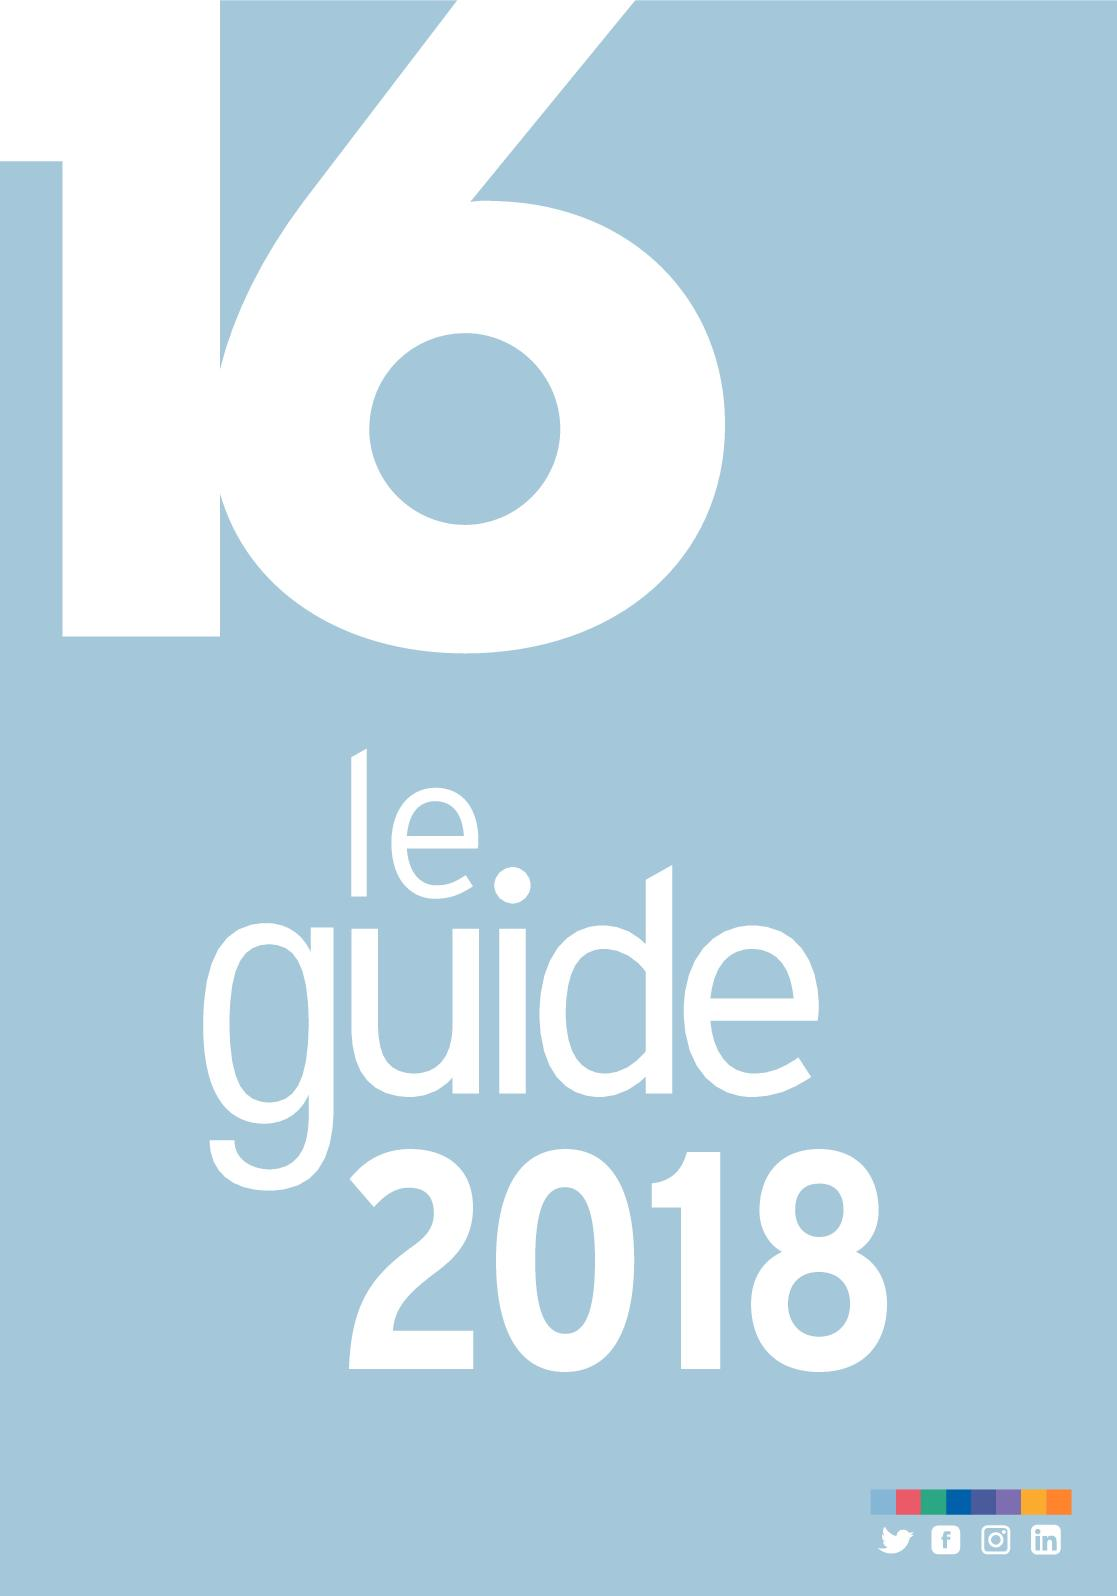 Vita Confort 25 Rue Lecourbe calaméo - guide maire du 16e 2018